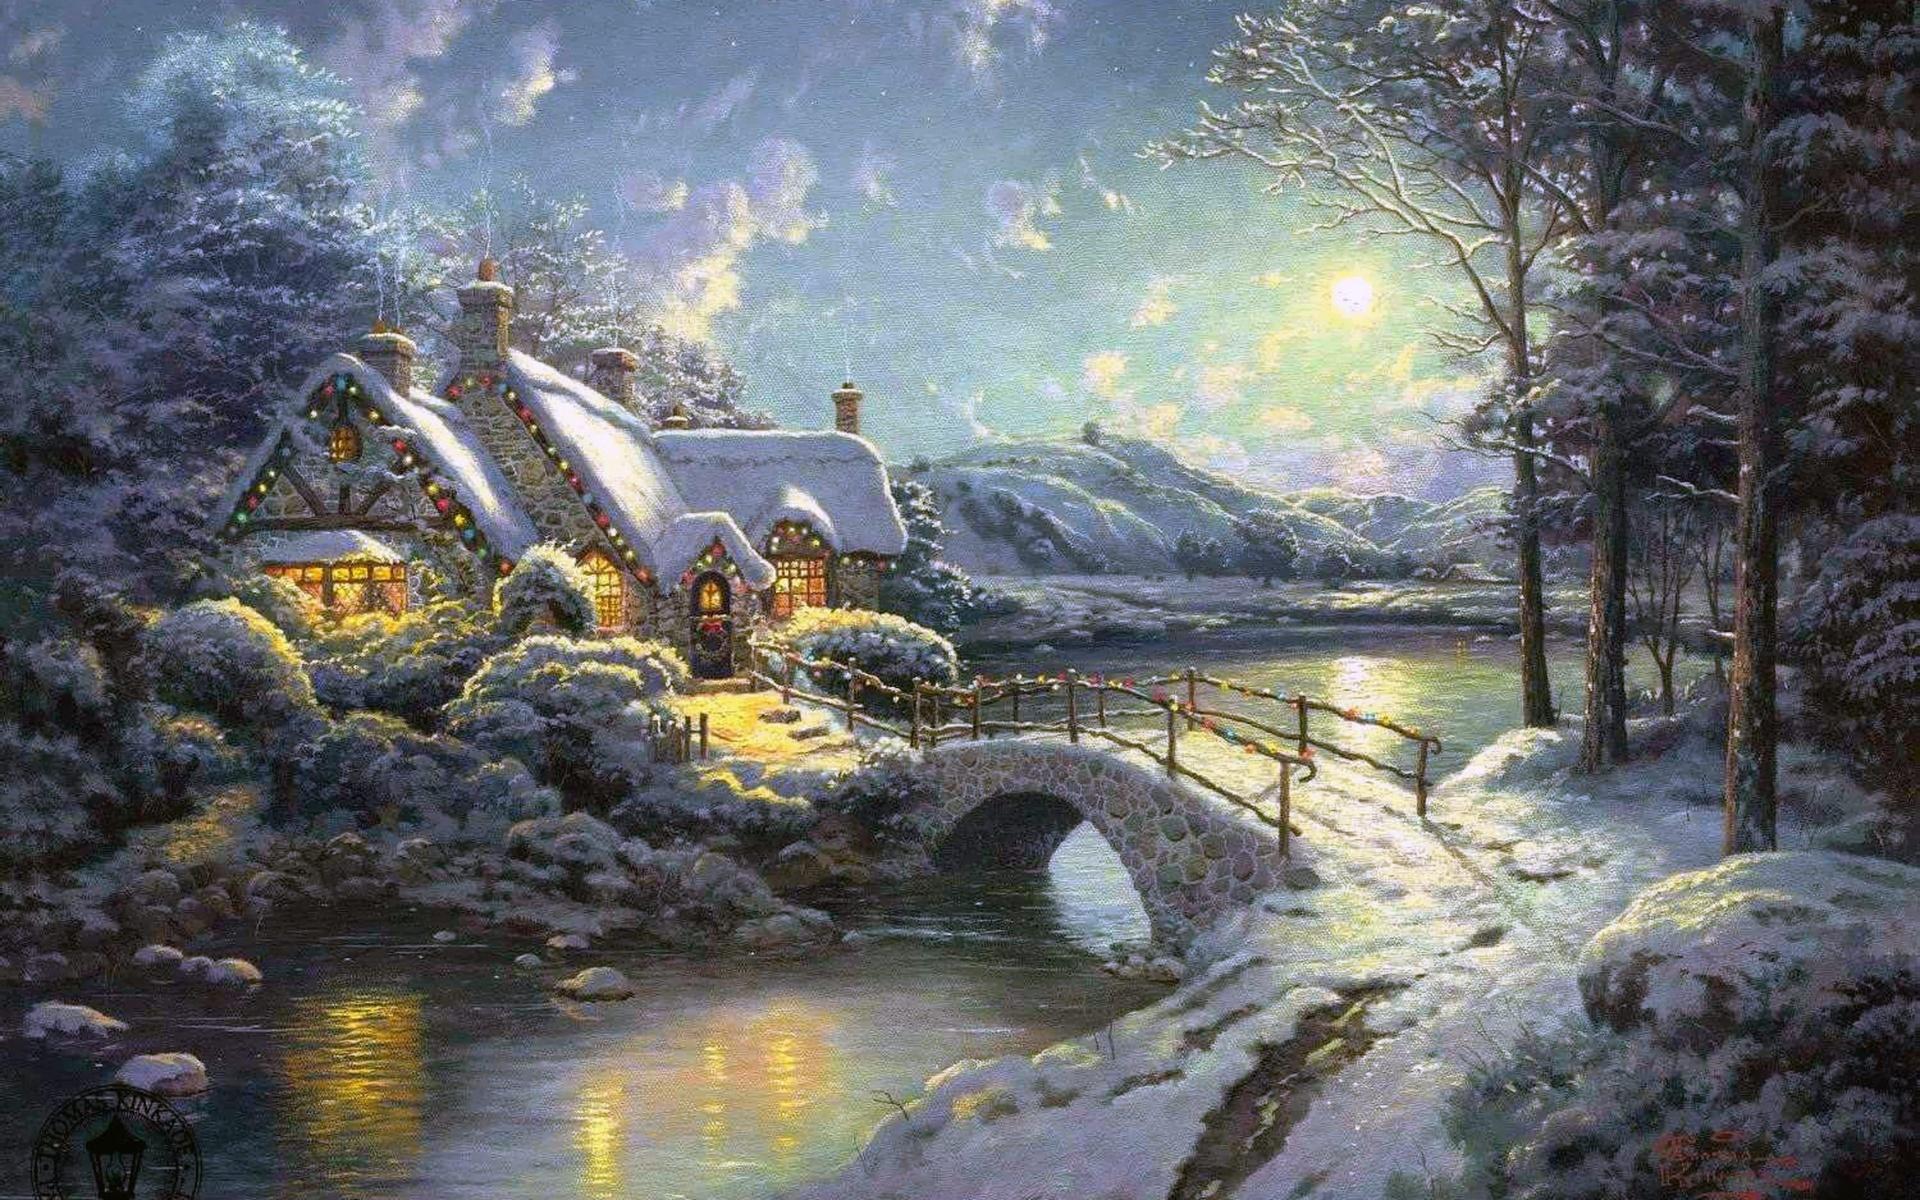 зима, рождество, лунный свет, лес, дом, речка, мост, thomas kinkade